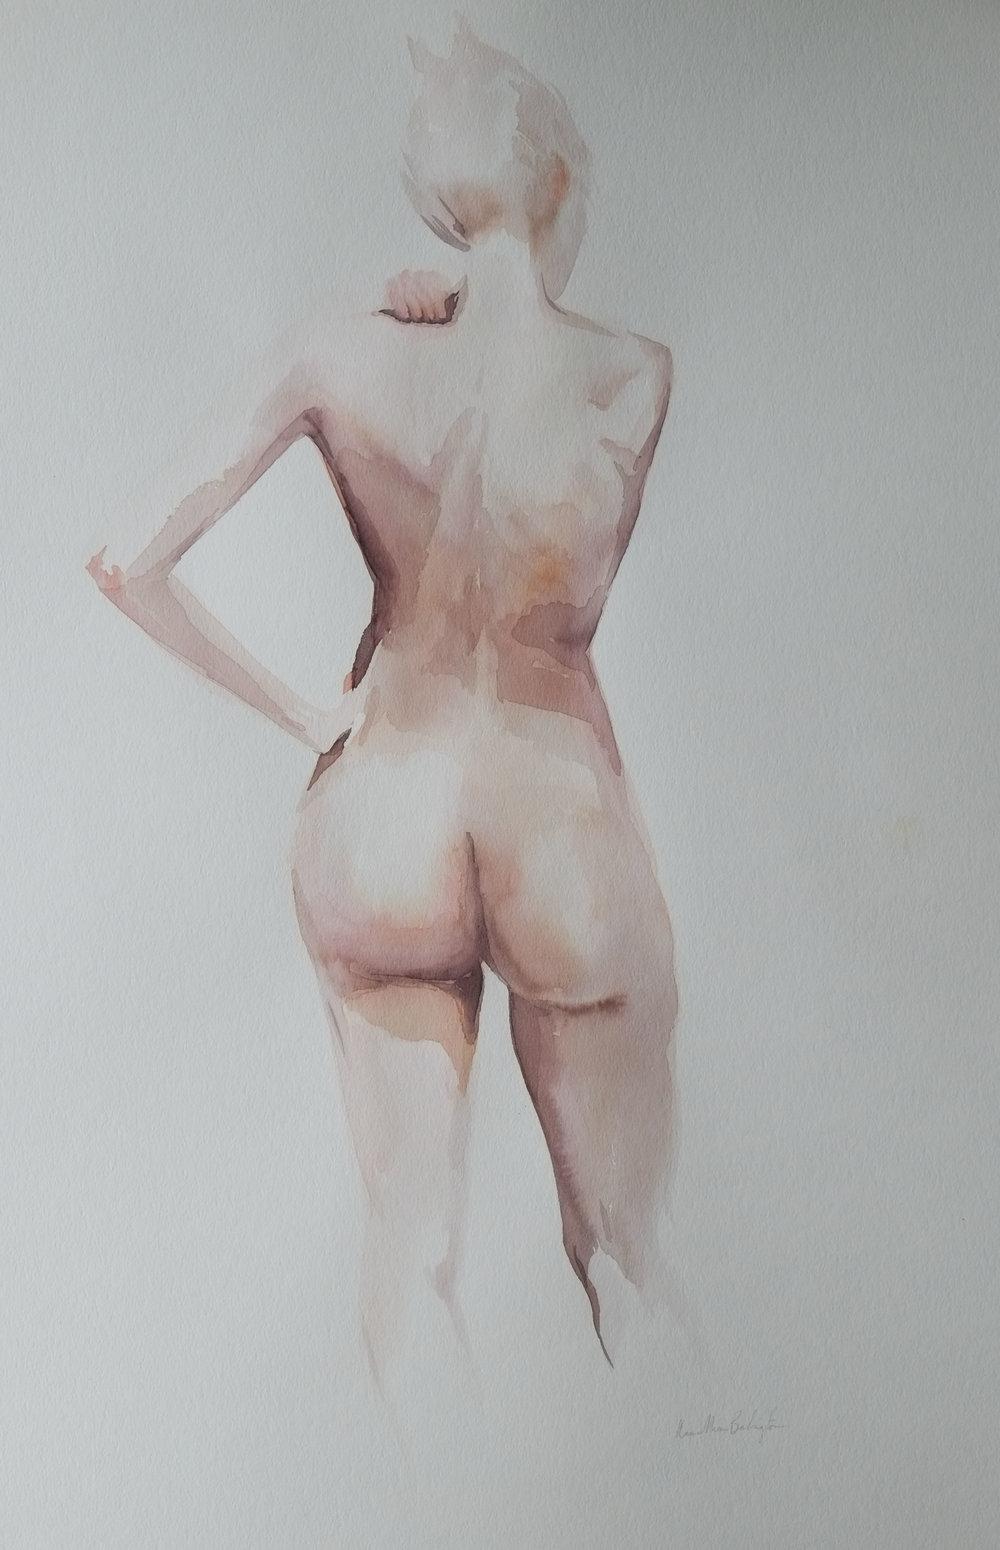 painting_april2017_0063_362.JPG